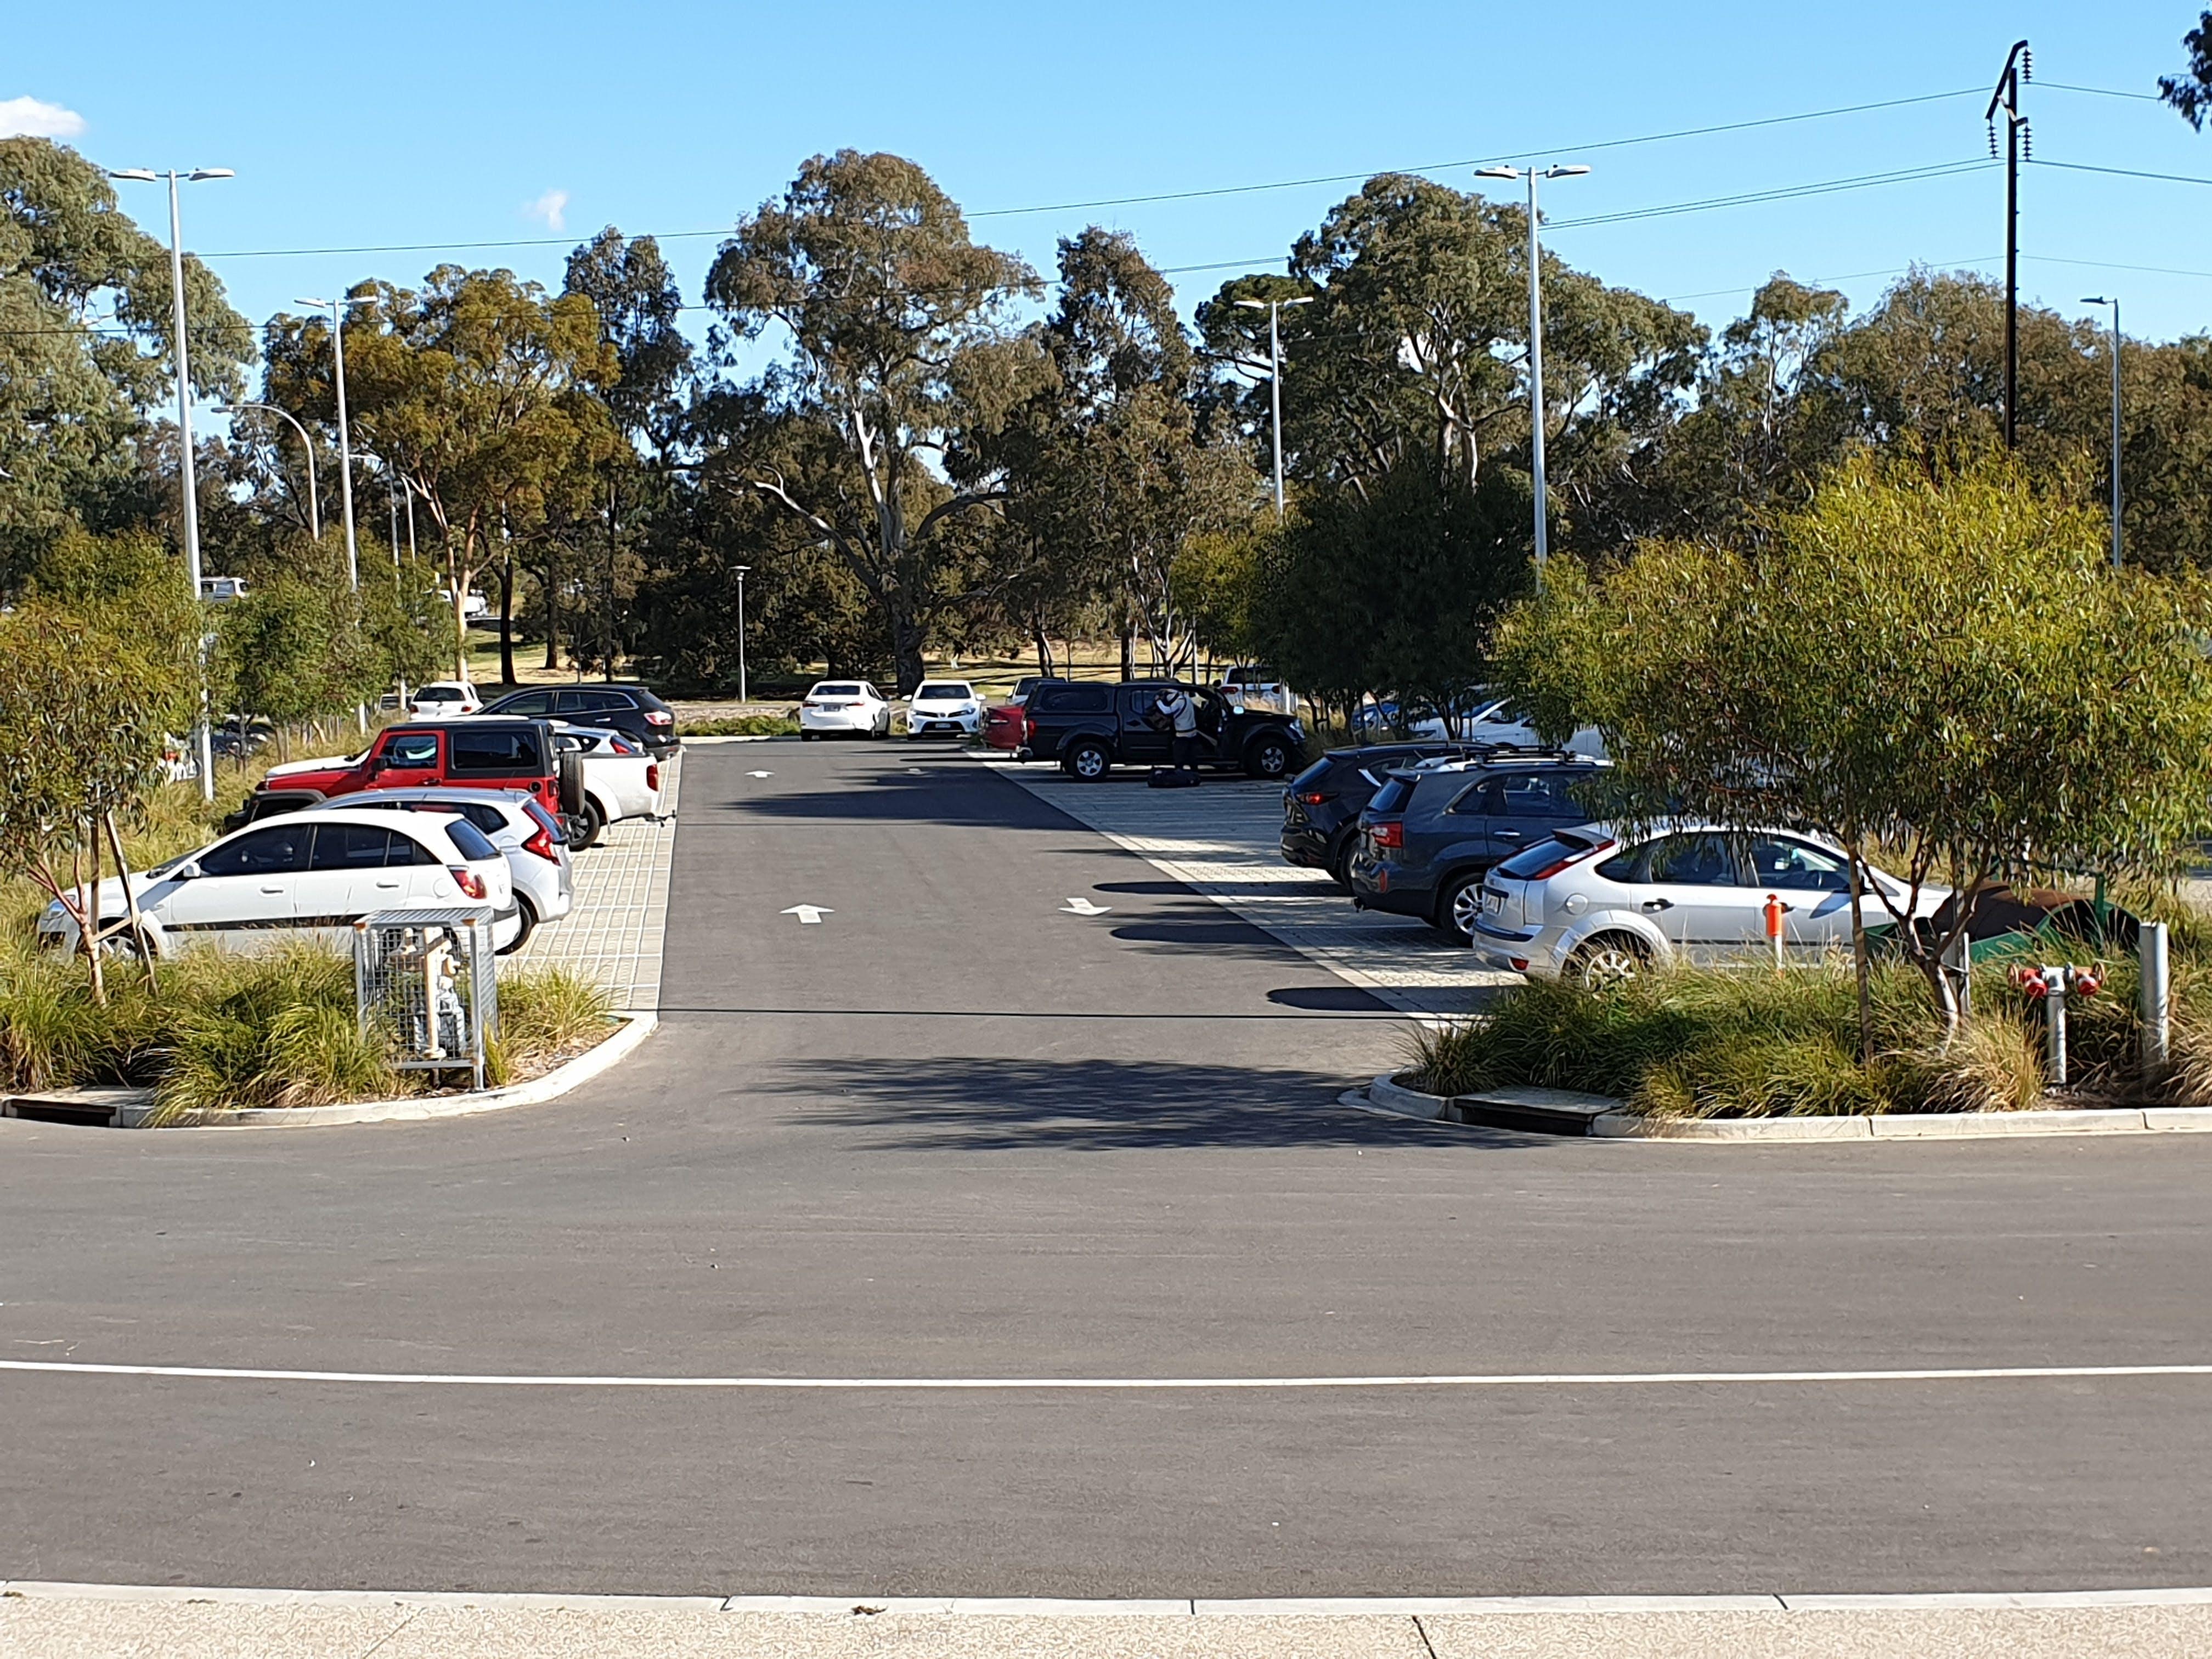 View of South Car Park